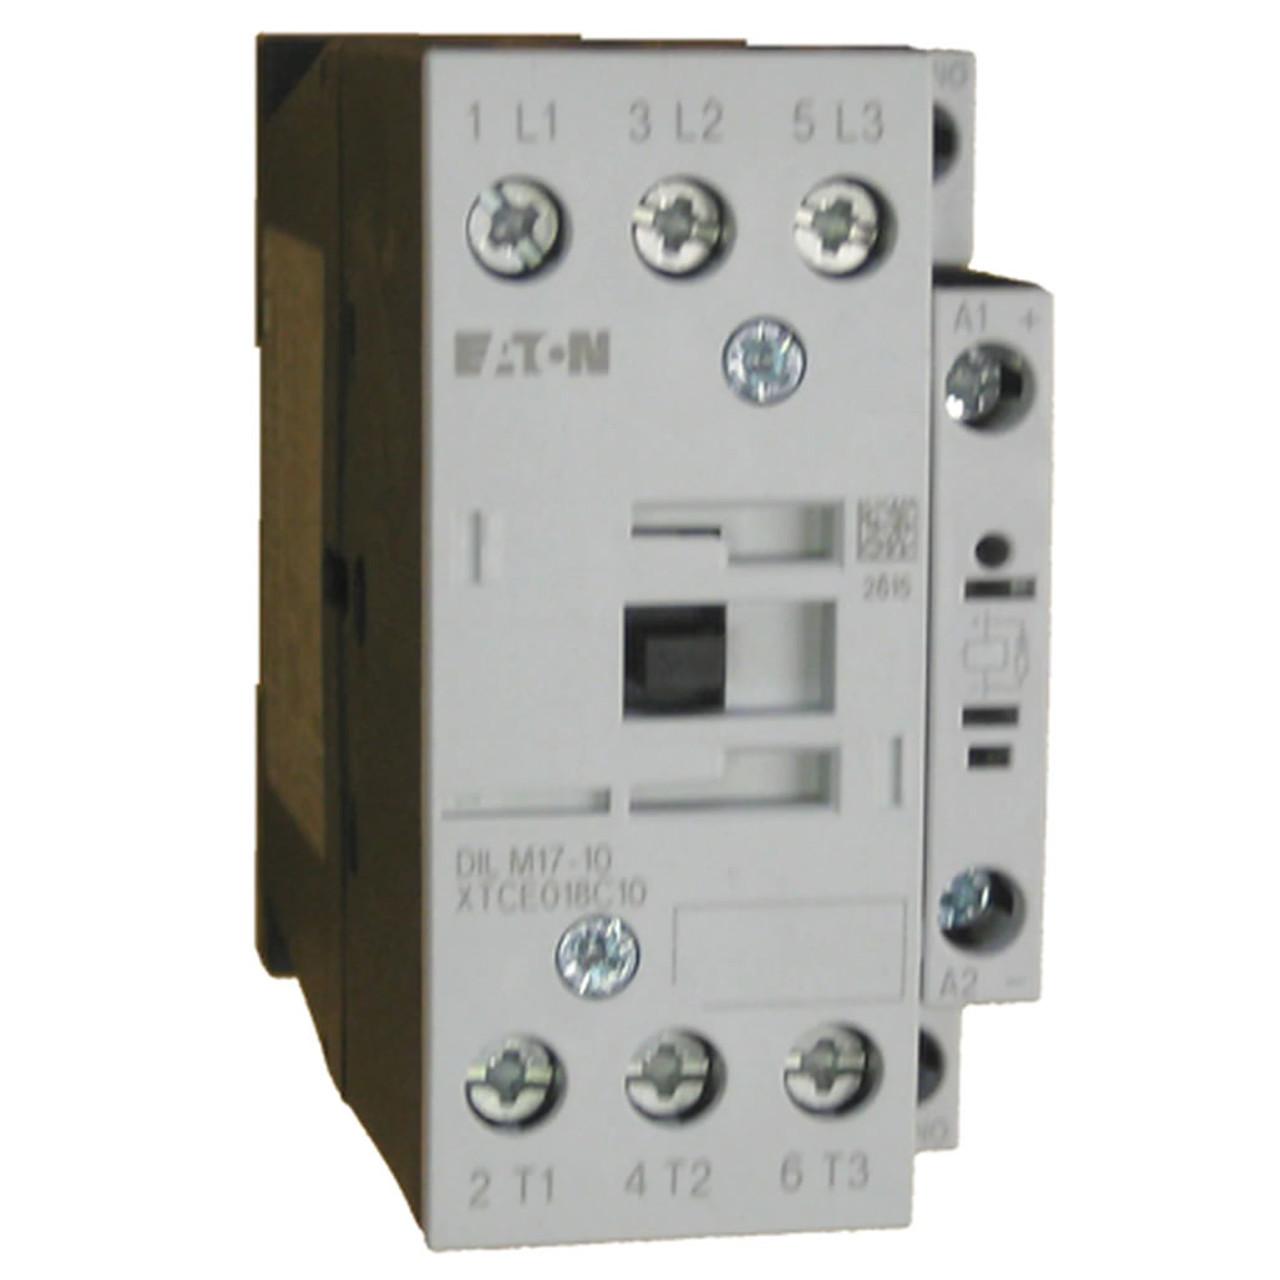 Eaton XTCE018C10H contactor